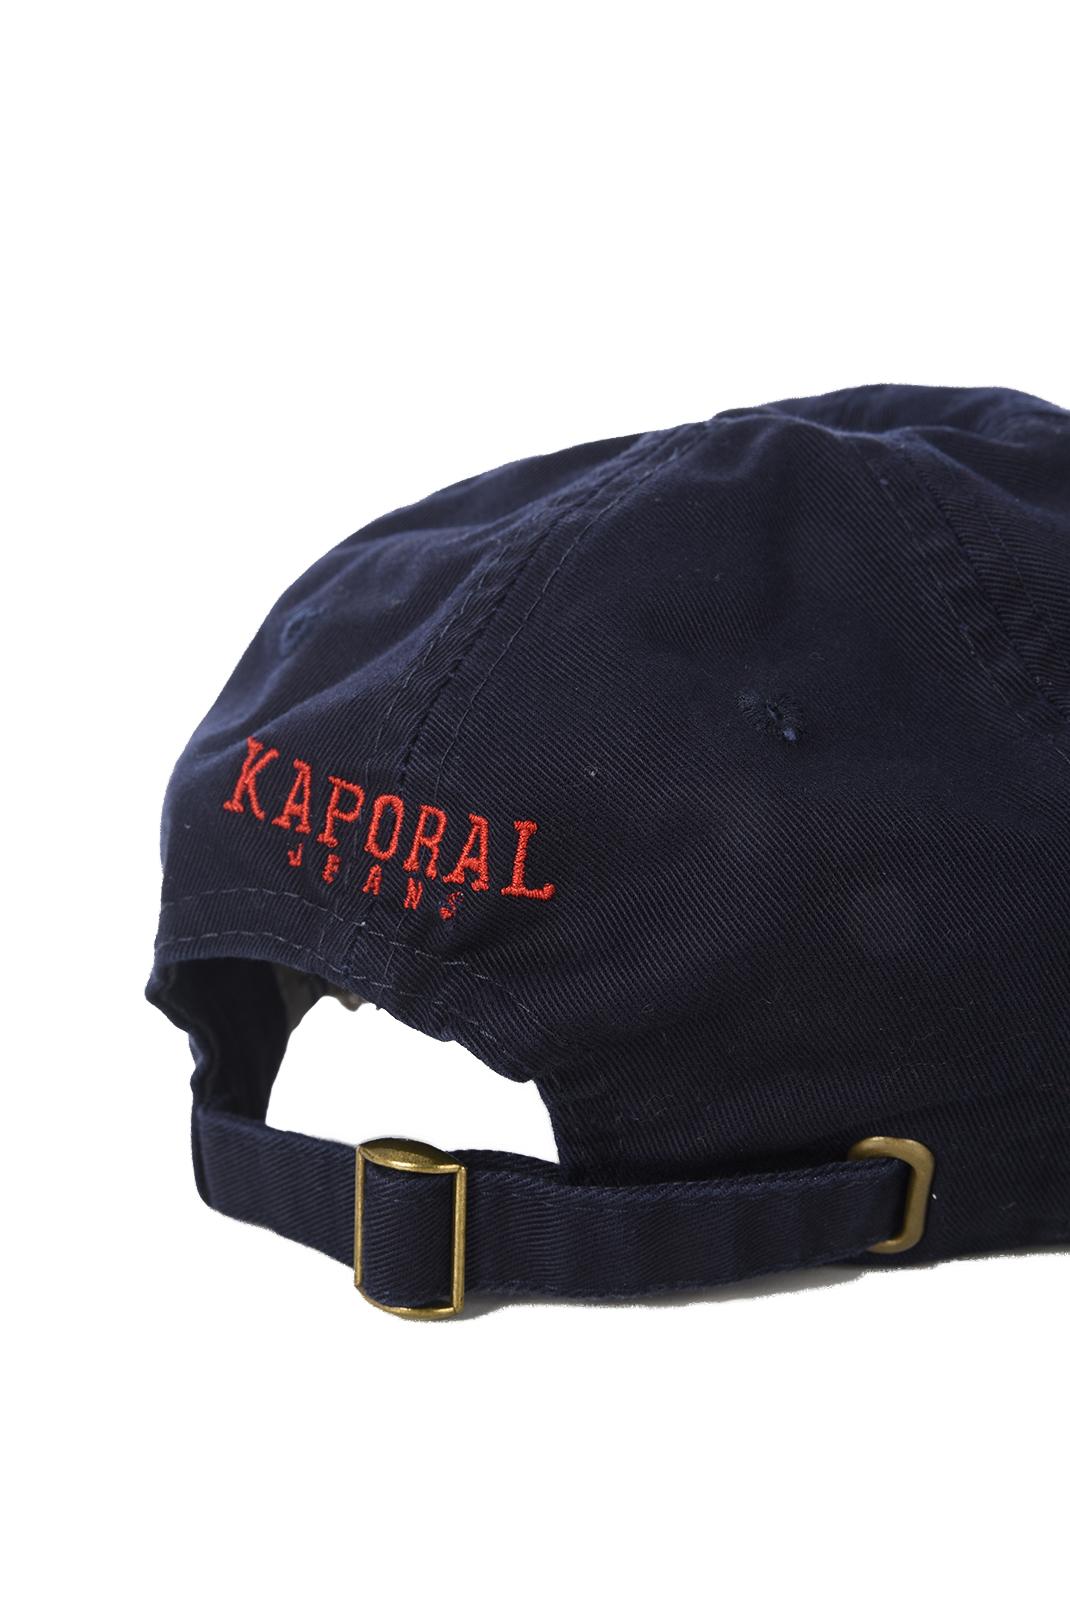 Bonnets / Casquettes  Kaporal MAD NAVY